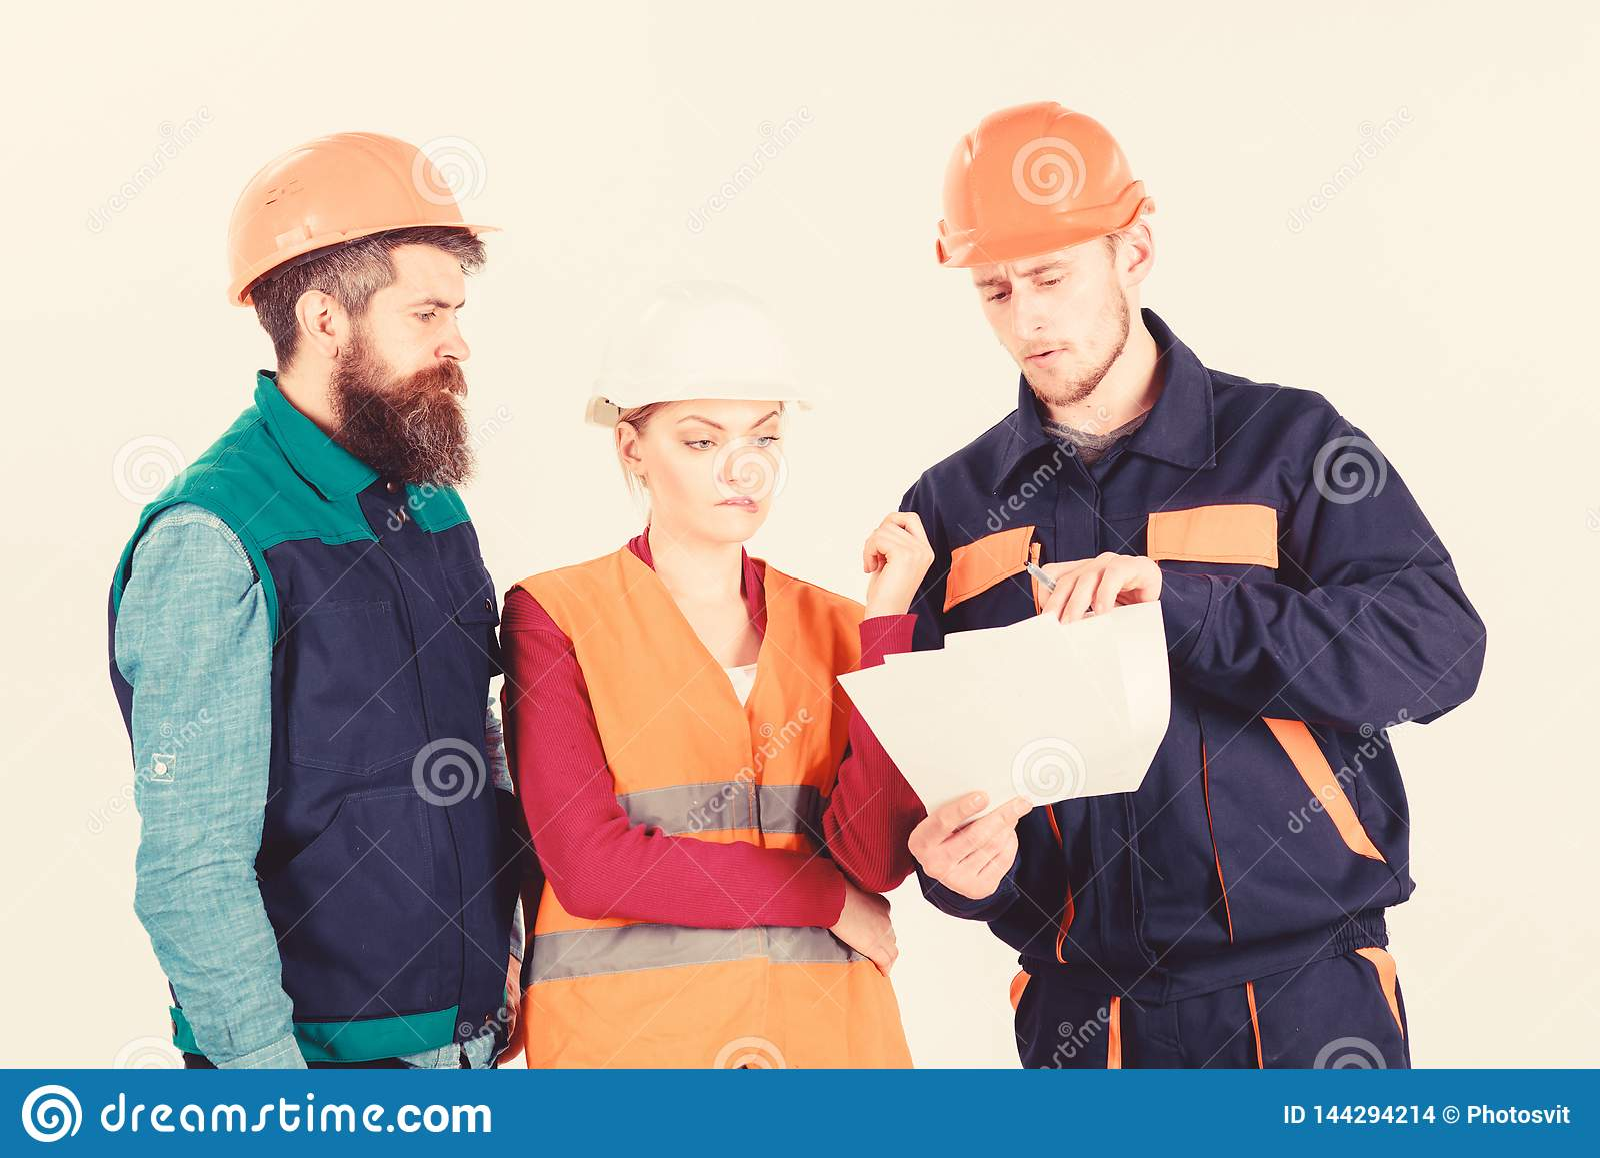 Constructores e ingeniero que discuten, entendiendo mal Equipo de arquitectos, ingenieros